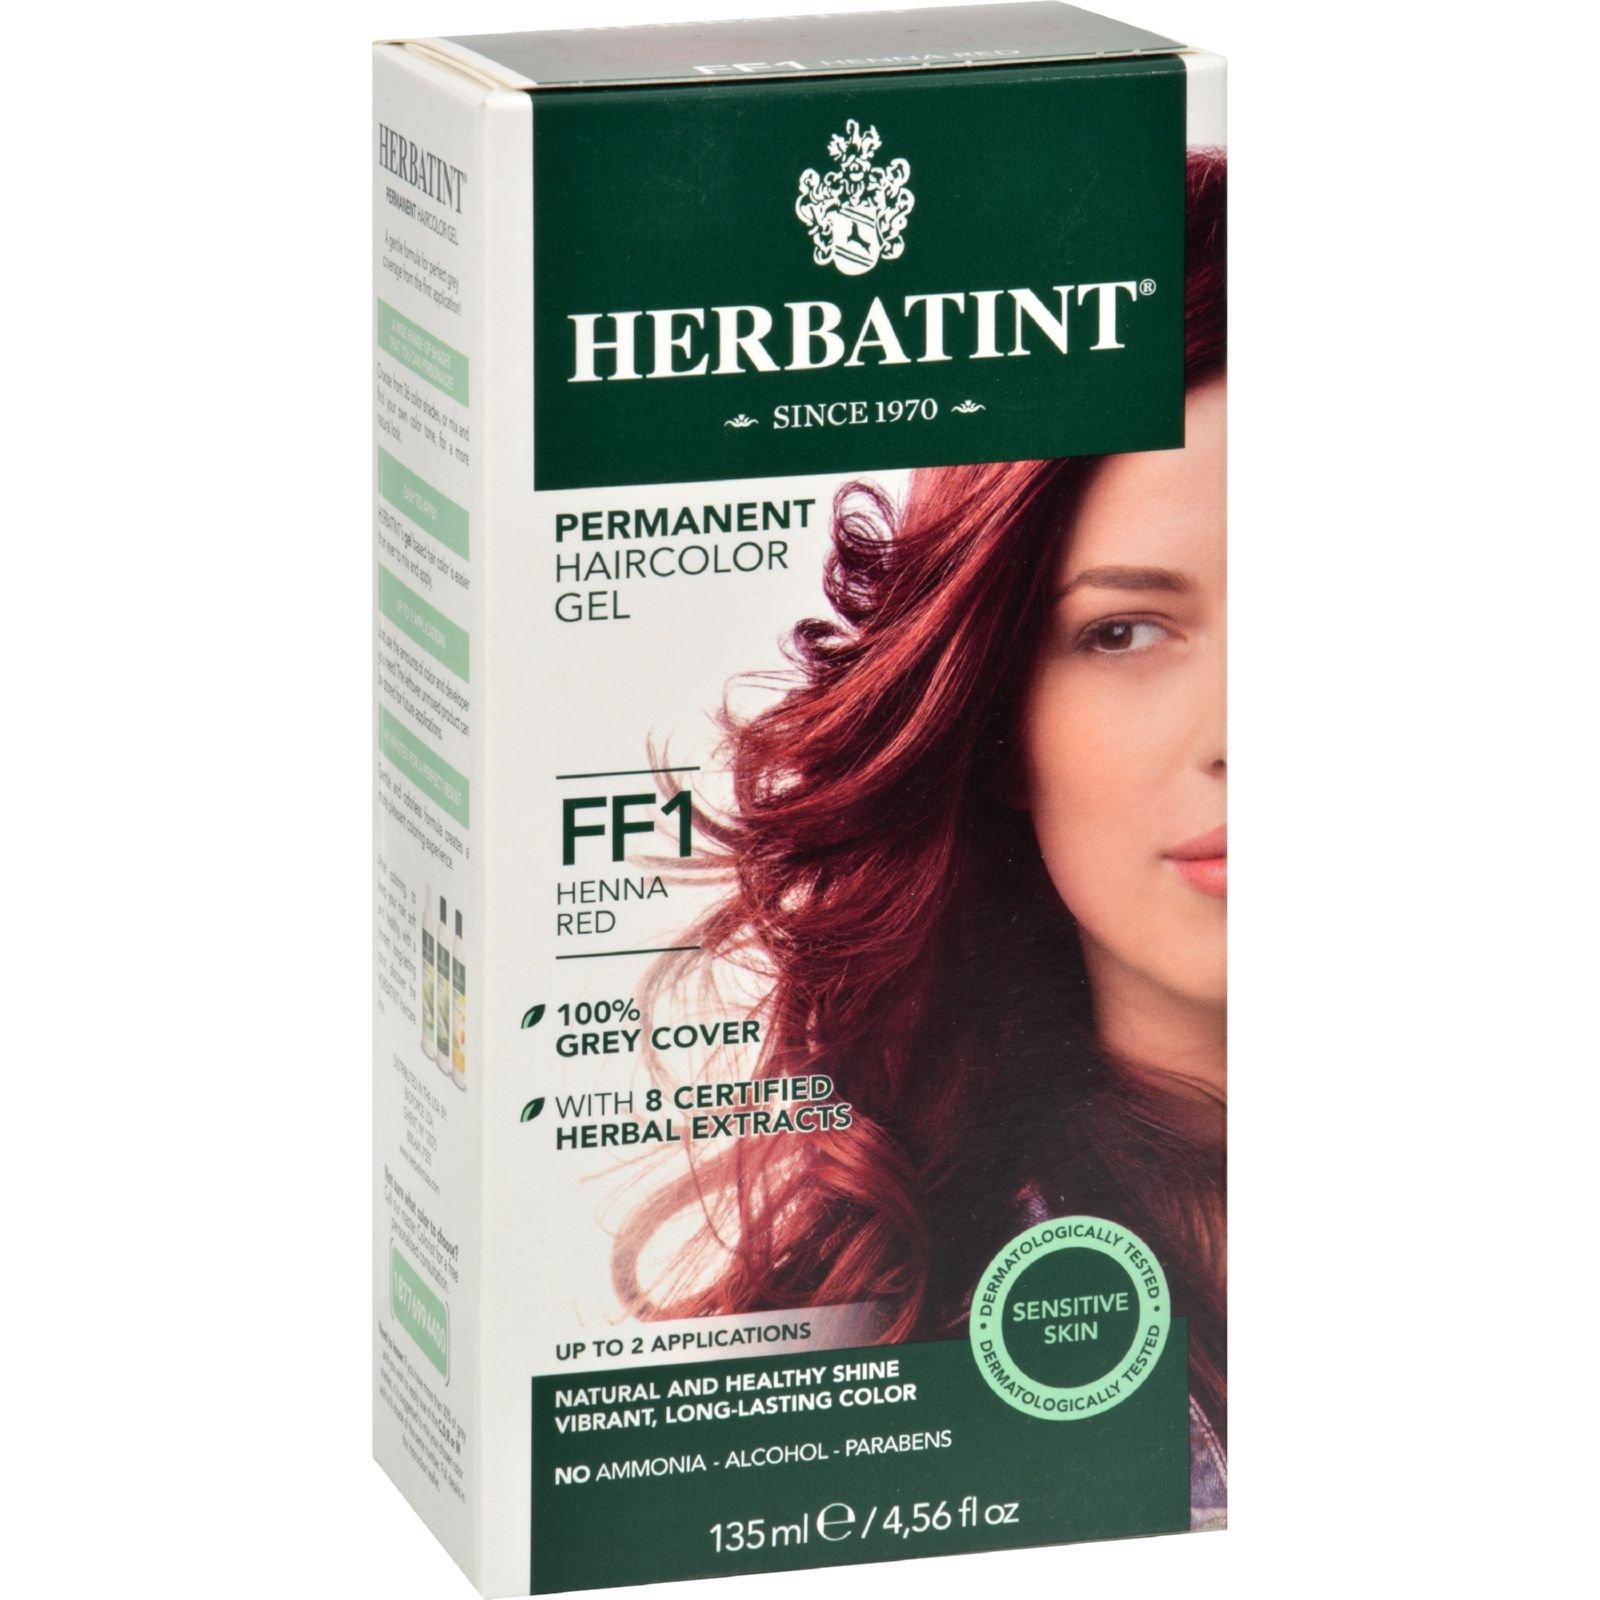 Herbatint Haircolor Kit Flash Fashion Henna Red FF1 - Permanent HairColor Gel - No Ammonia - 1 Kit (Pack of 4) by Herbatint (Image #1)